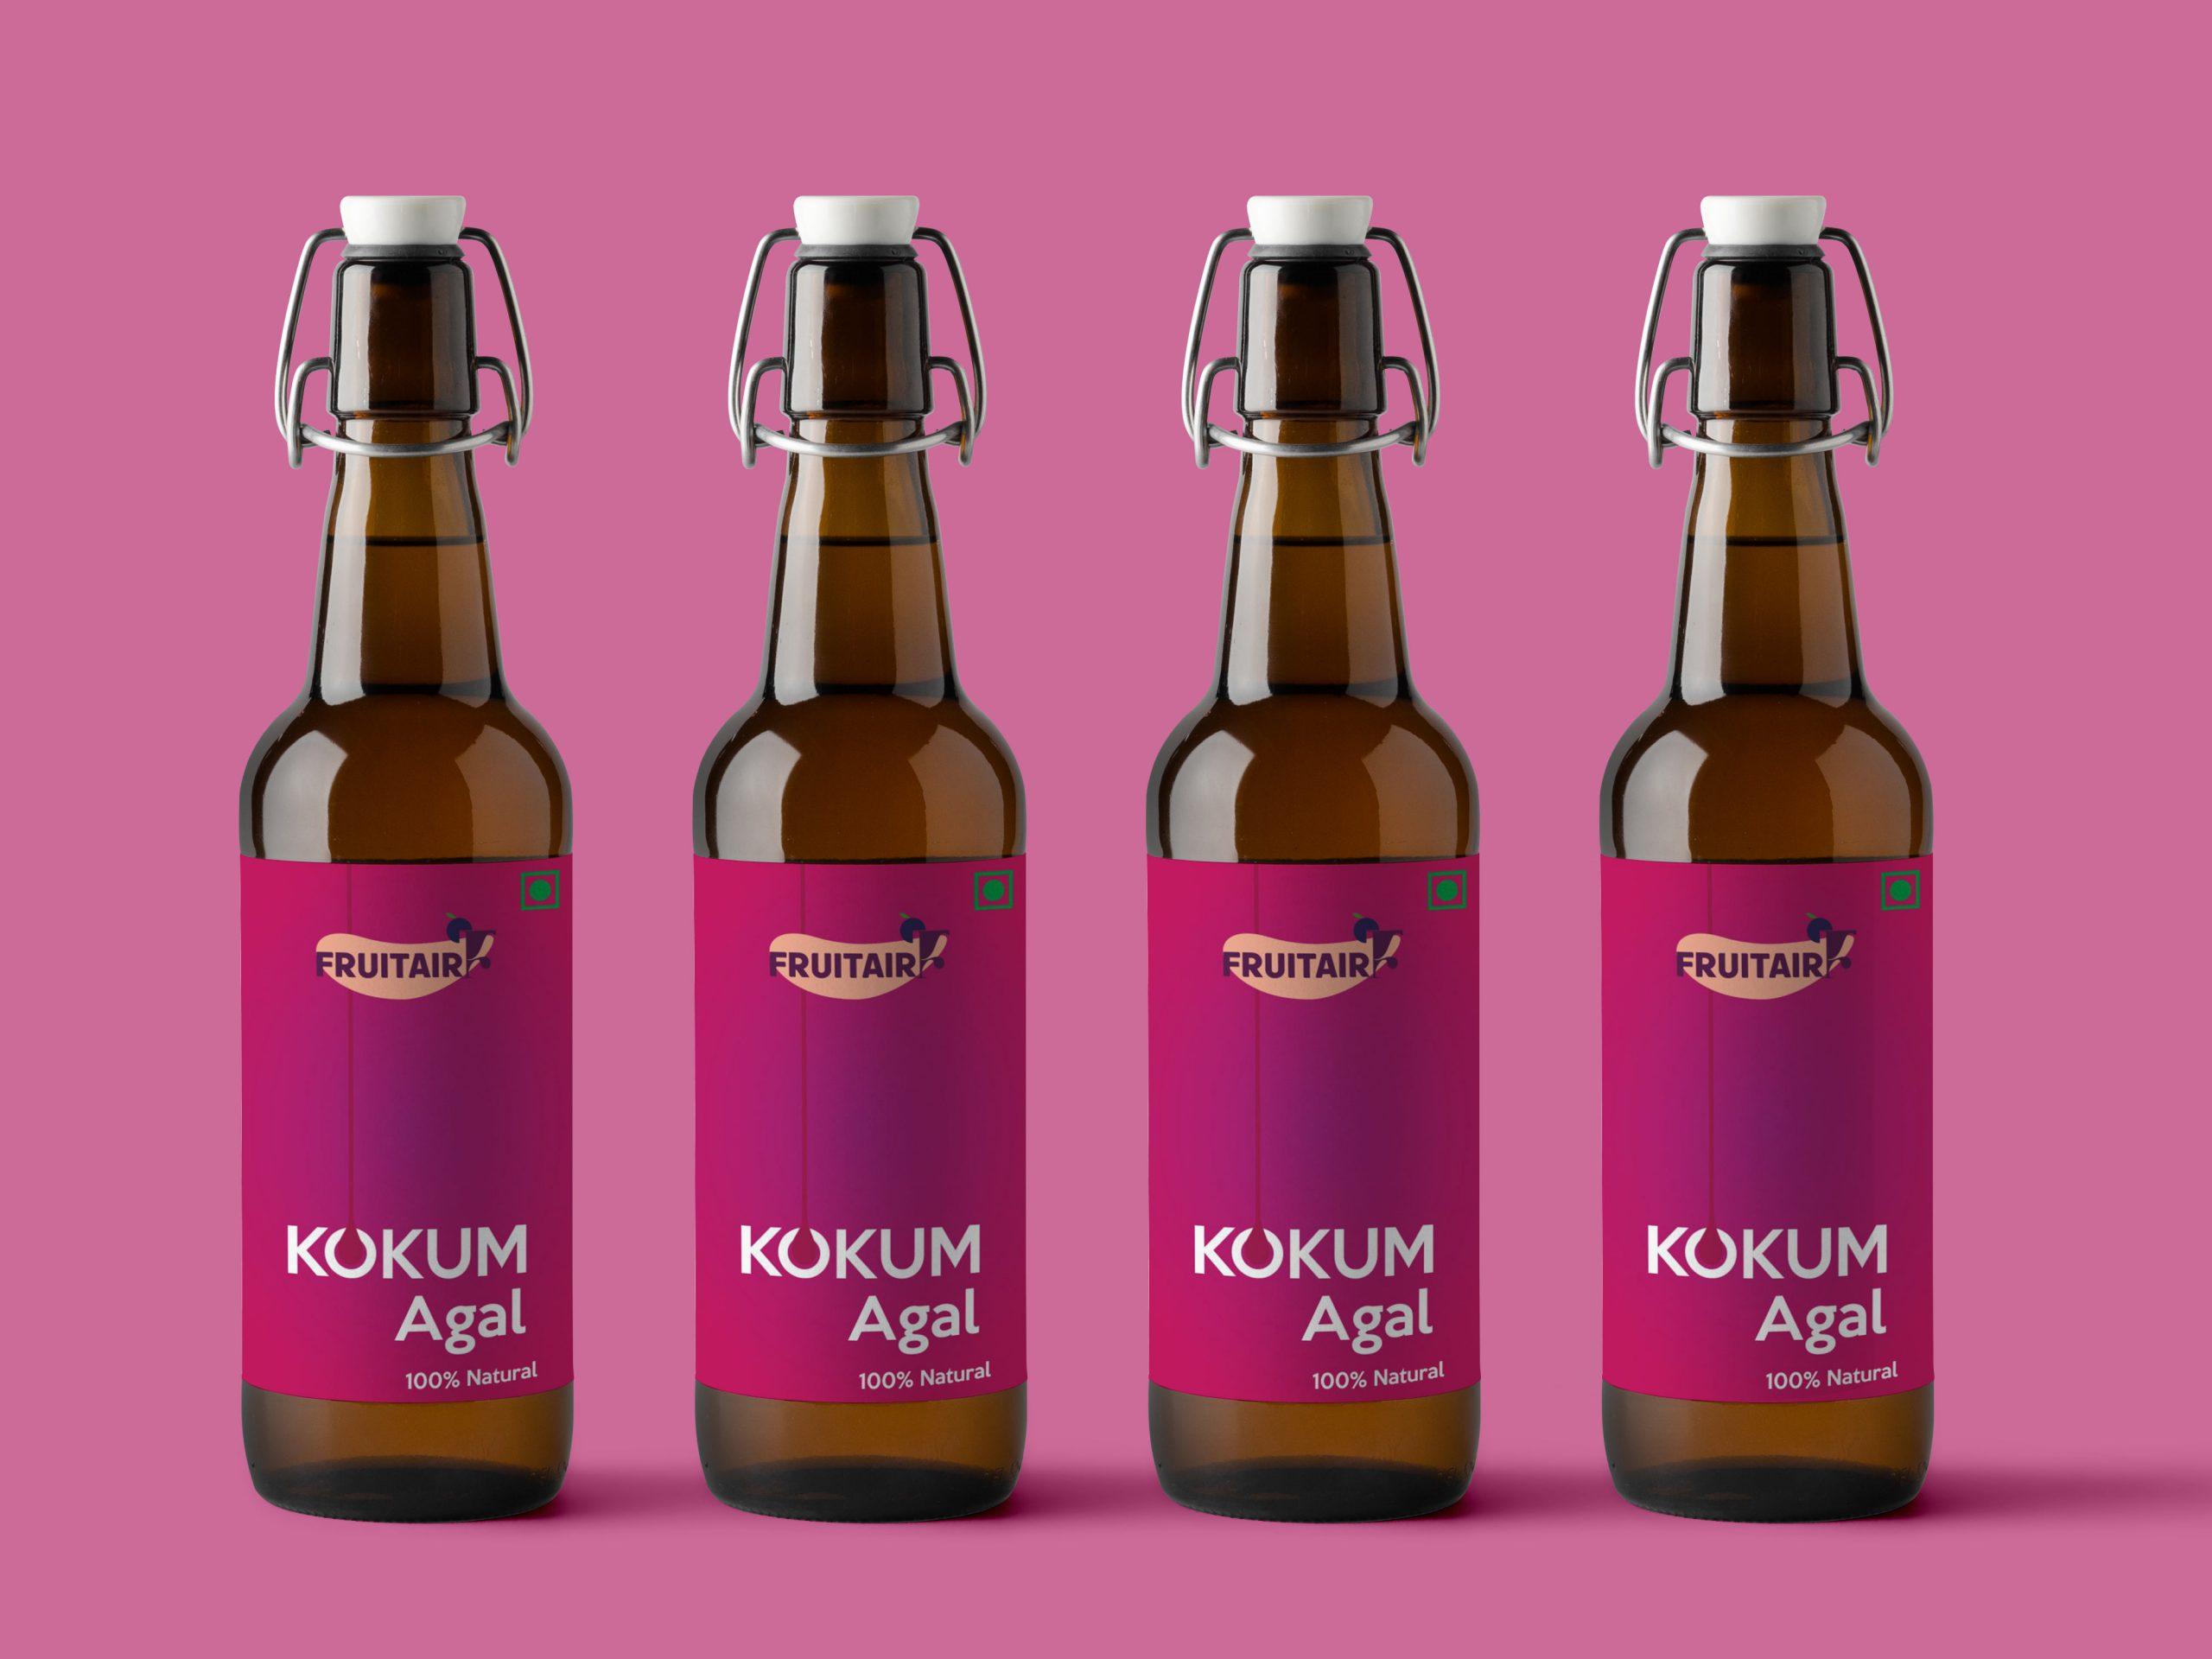 Fruitair Kokum Agal Packaging Design by WDSOFT